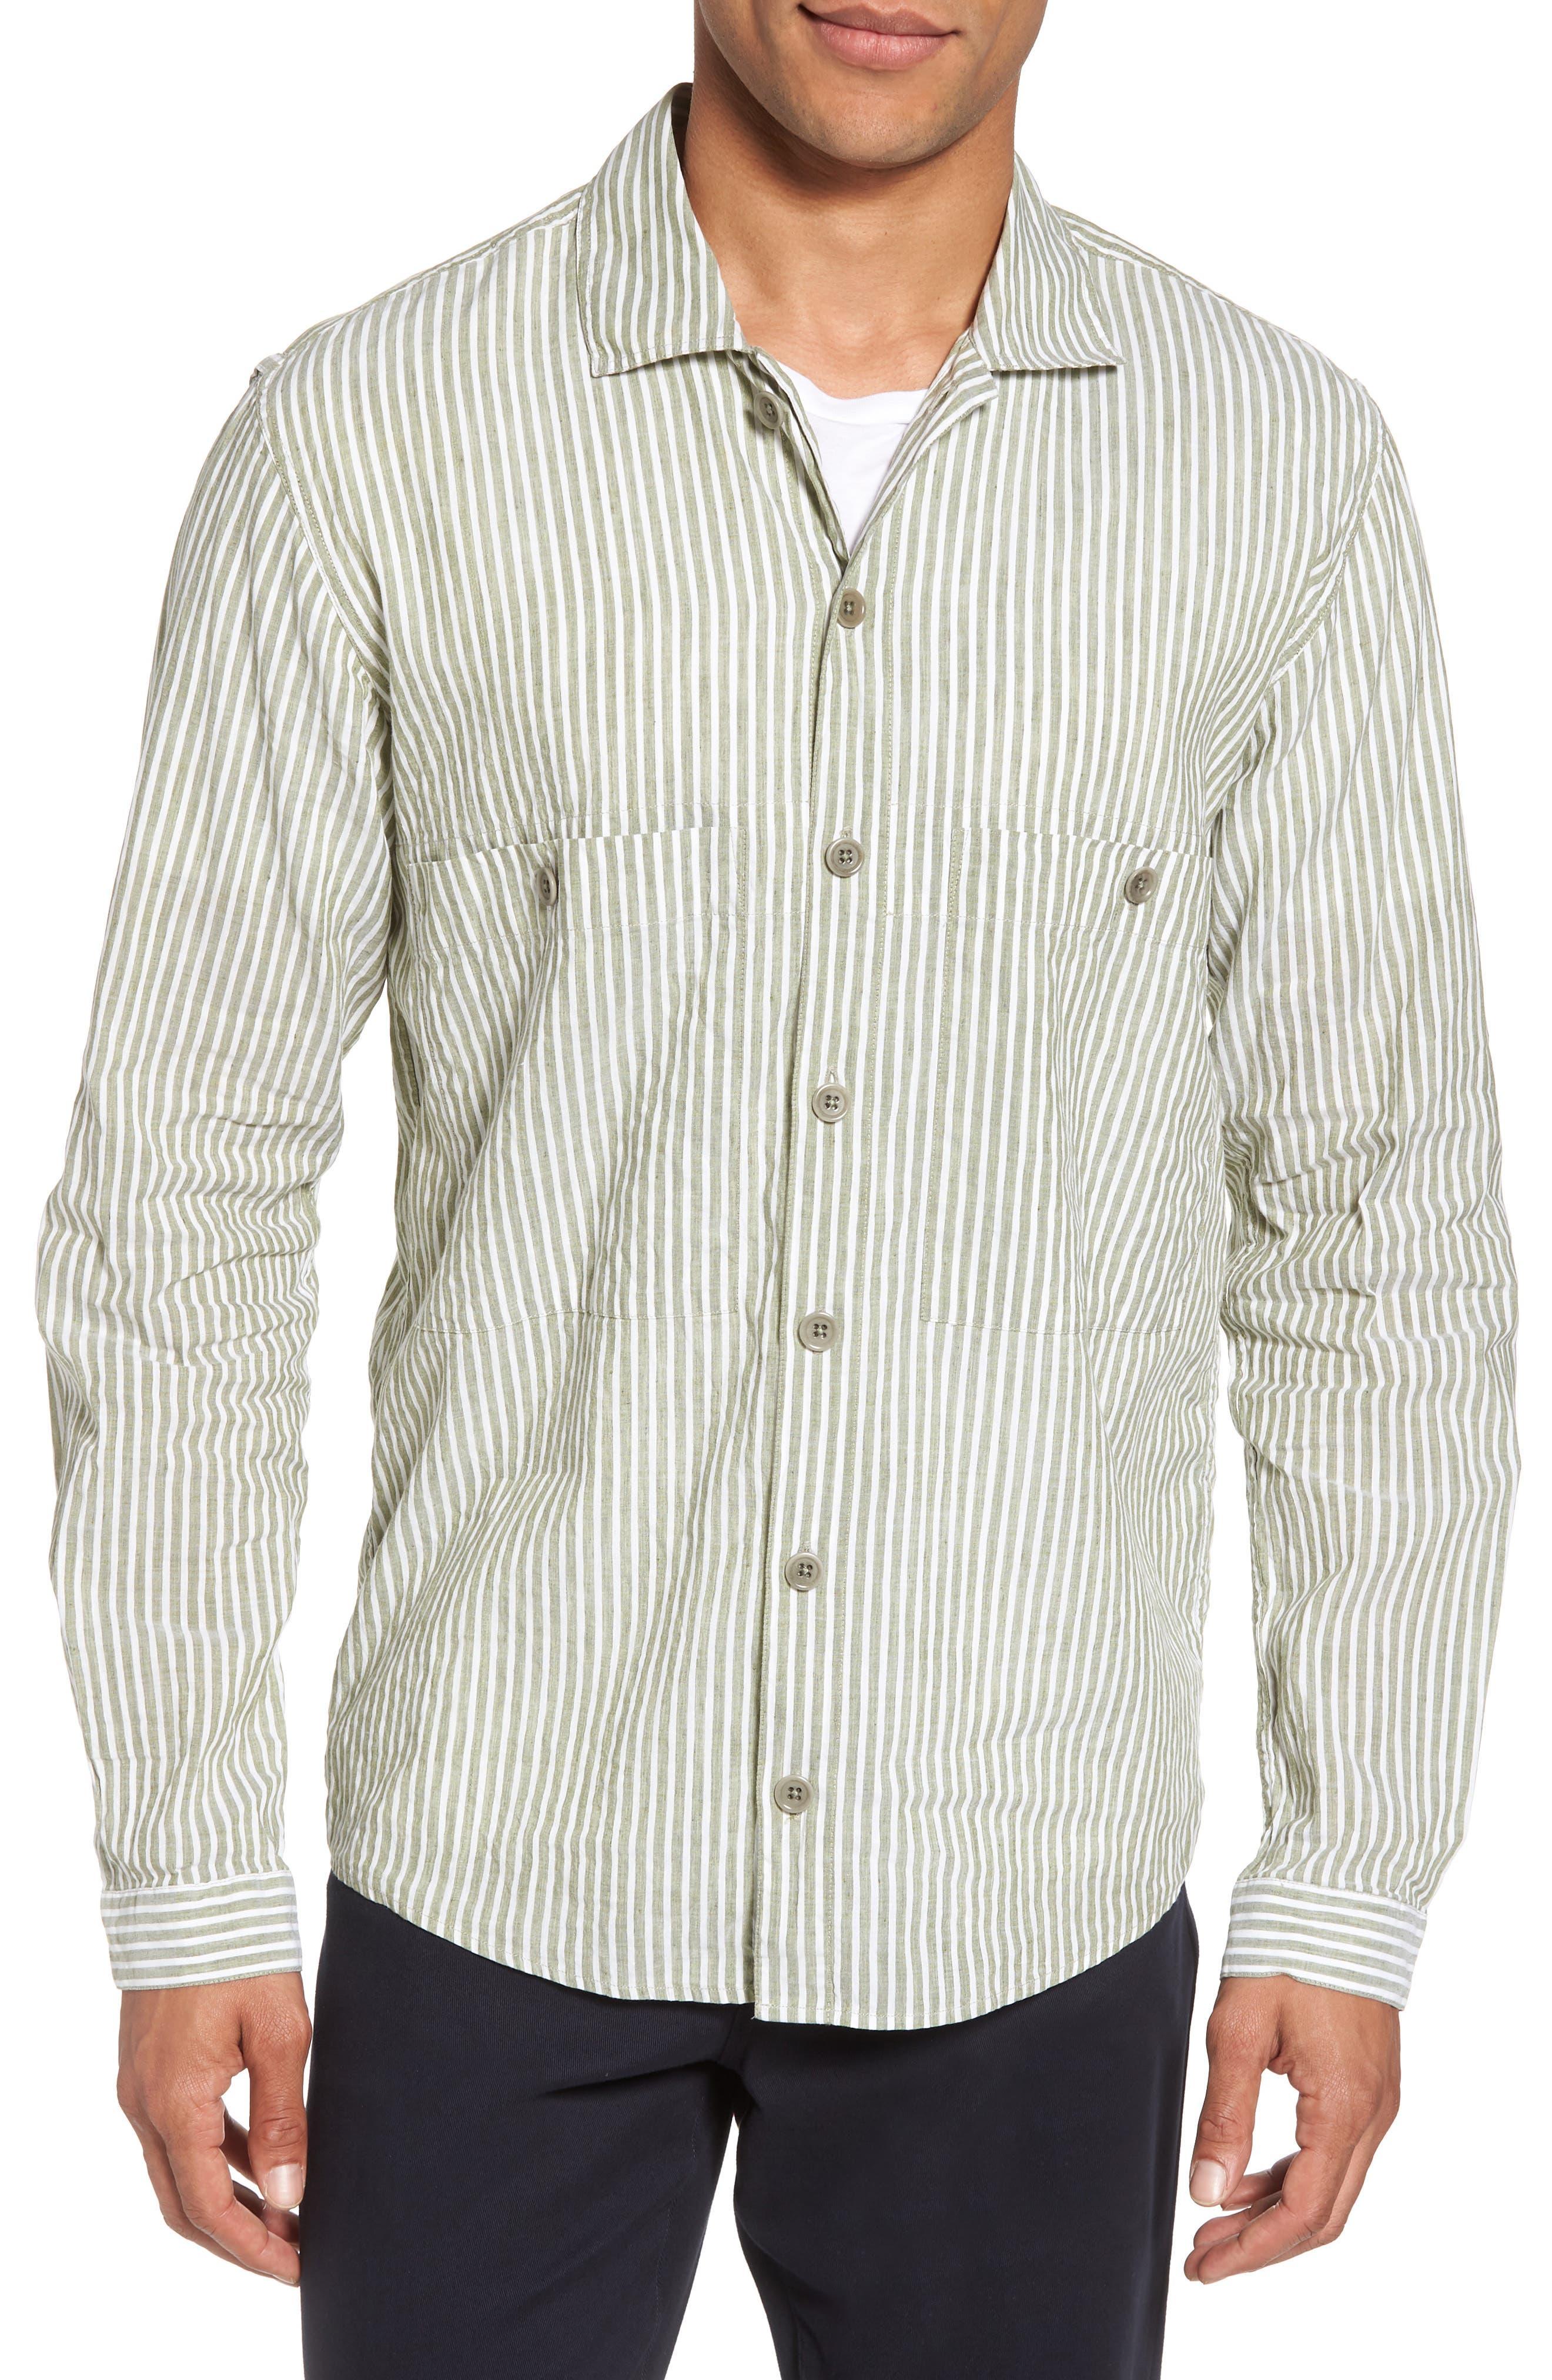 Doc Savage Regular Fit Sport Shirt,                         Main,                         color, Green